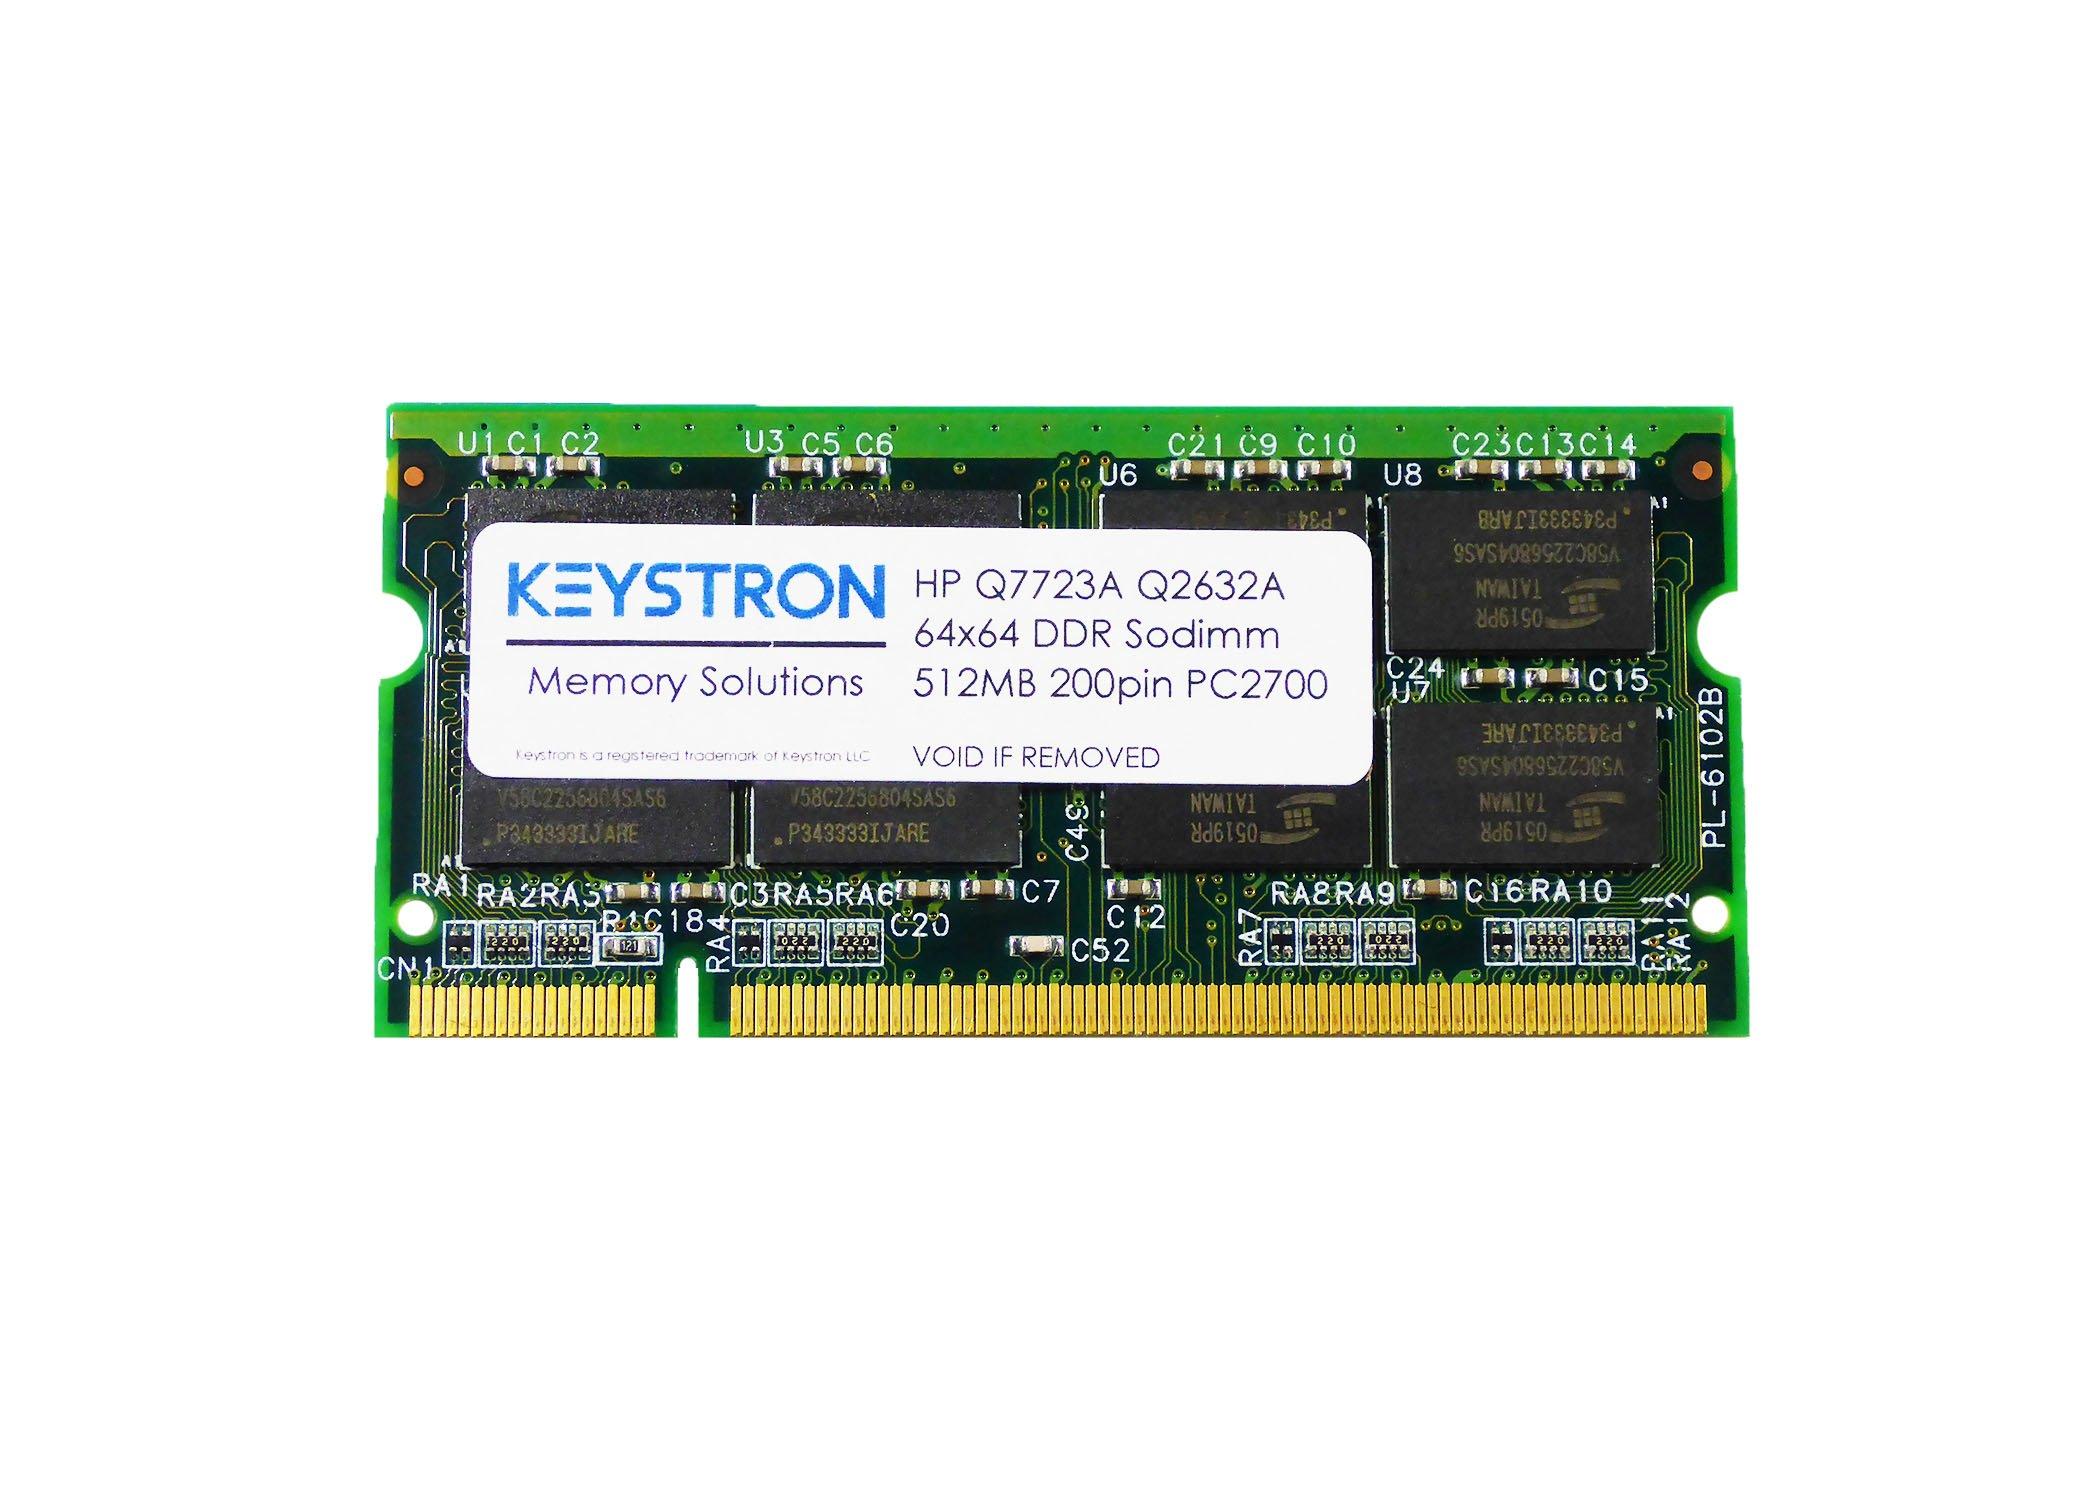 Keystron Kyocera 2GB Printer Memory Upgrade (855D200714) SD-144-2GB by Keystron